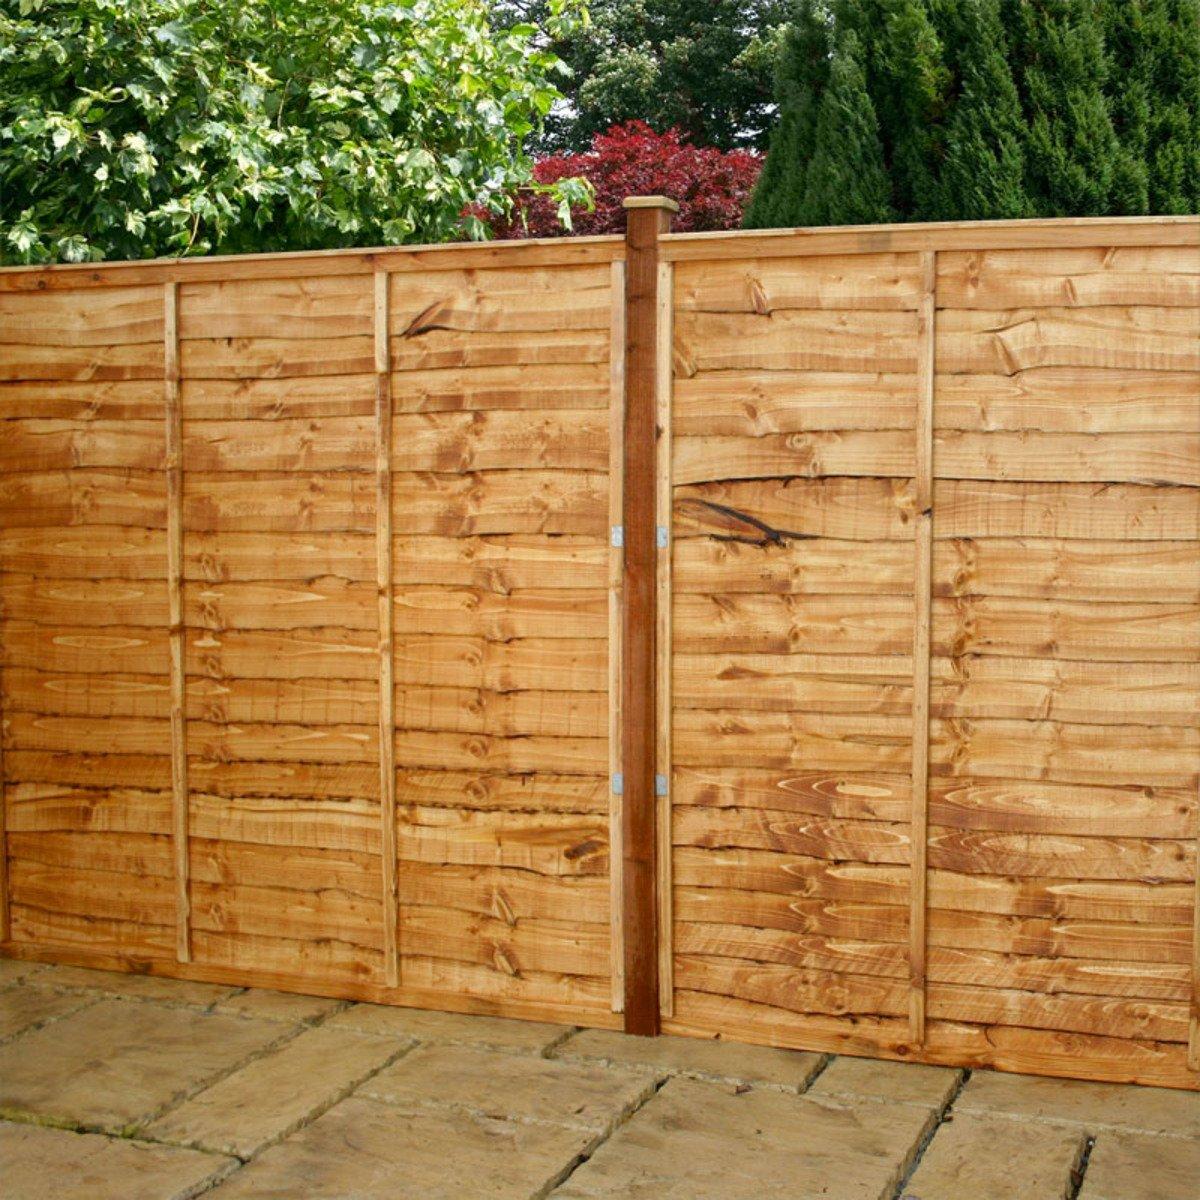 fence 6ft. 5ft X 6ft Waltons Horizontal Overlap PreTreated Wooden Garden Fence Panels Amazoncouk U0026 Outdoors